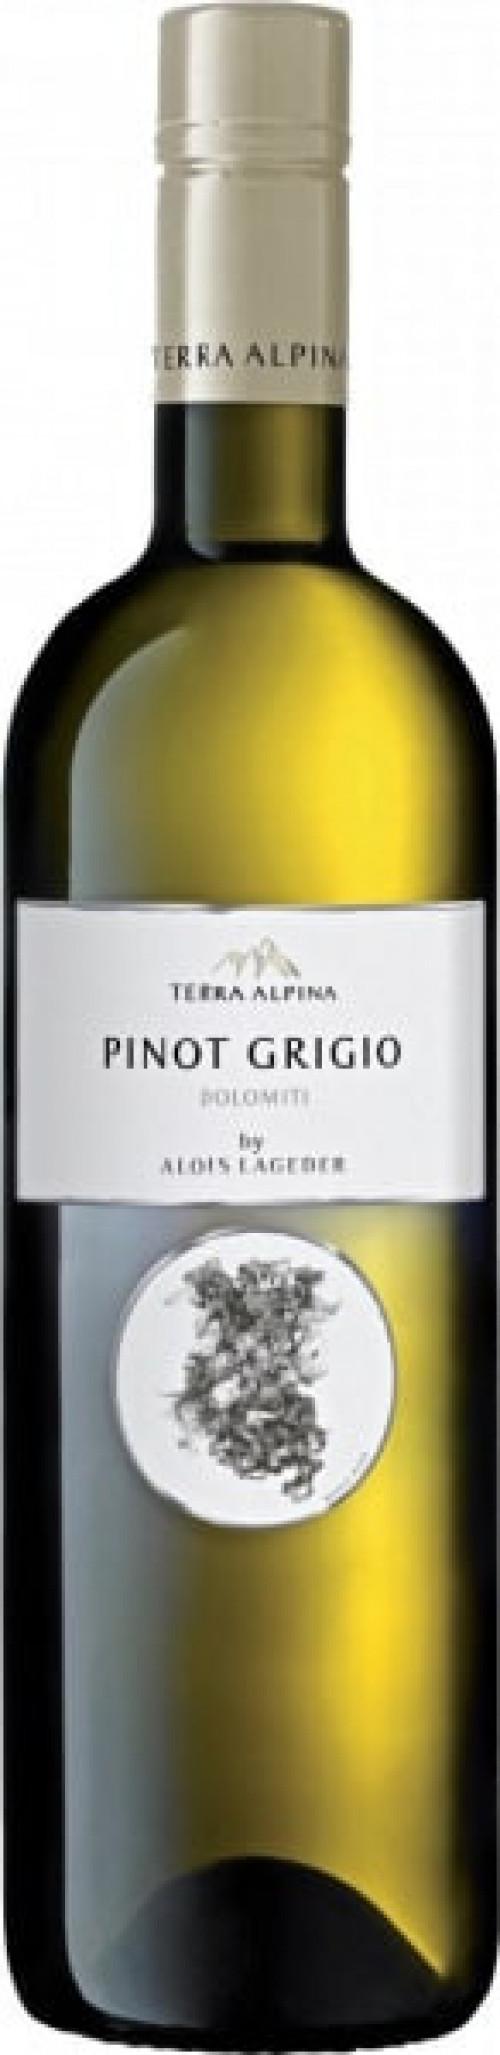 2020 Alois Lageder Terra Alpina Pinot Grigio 750ml